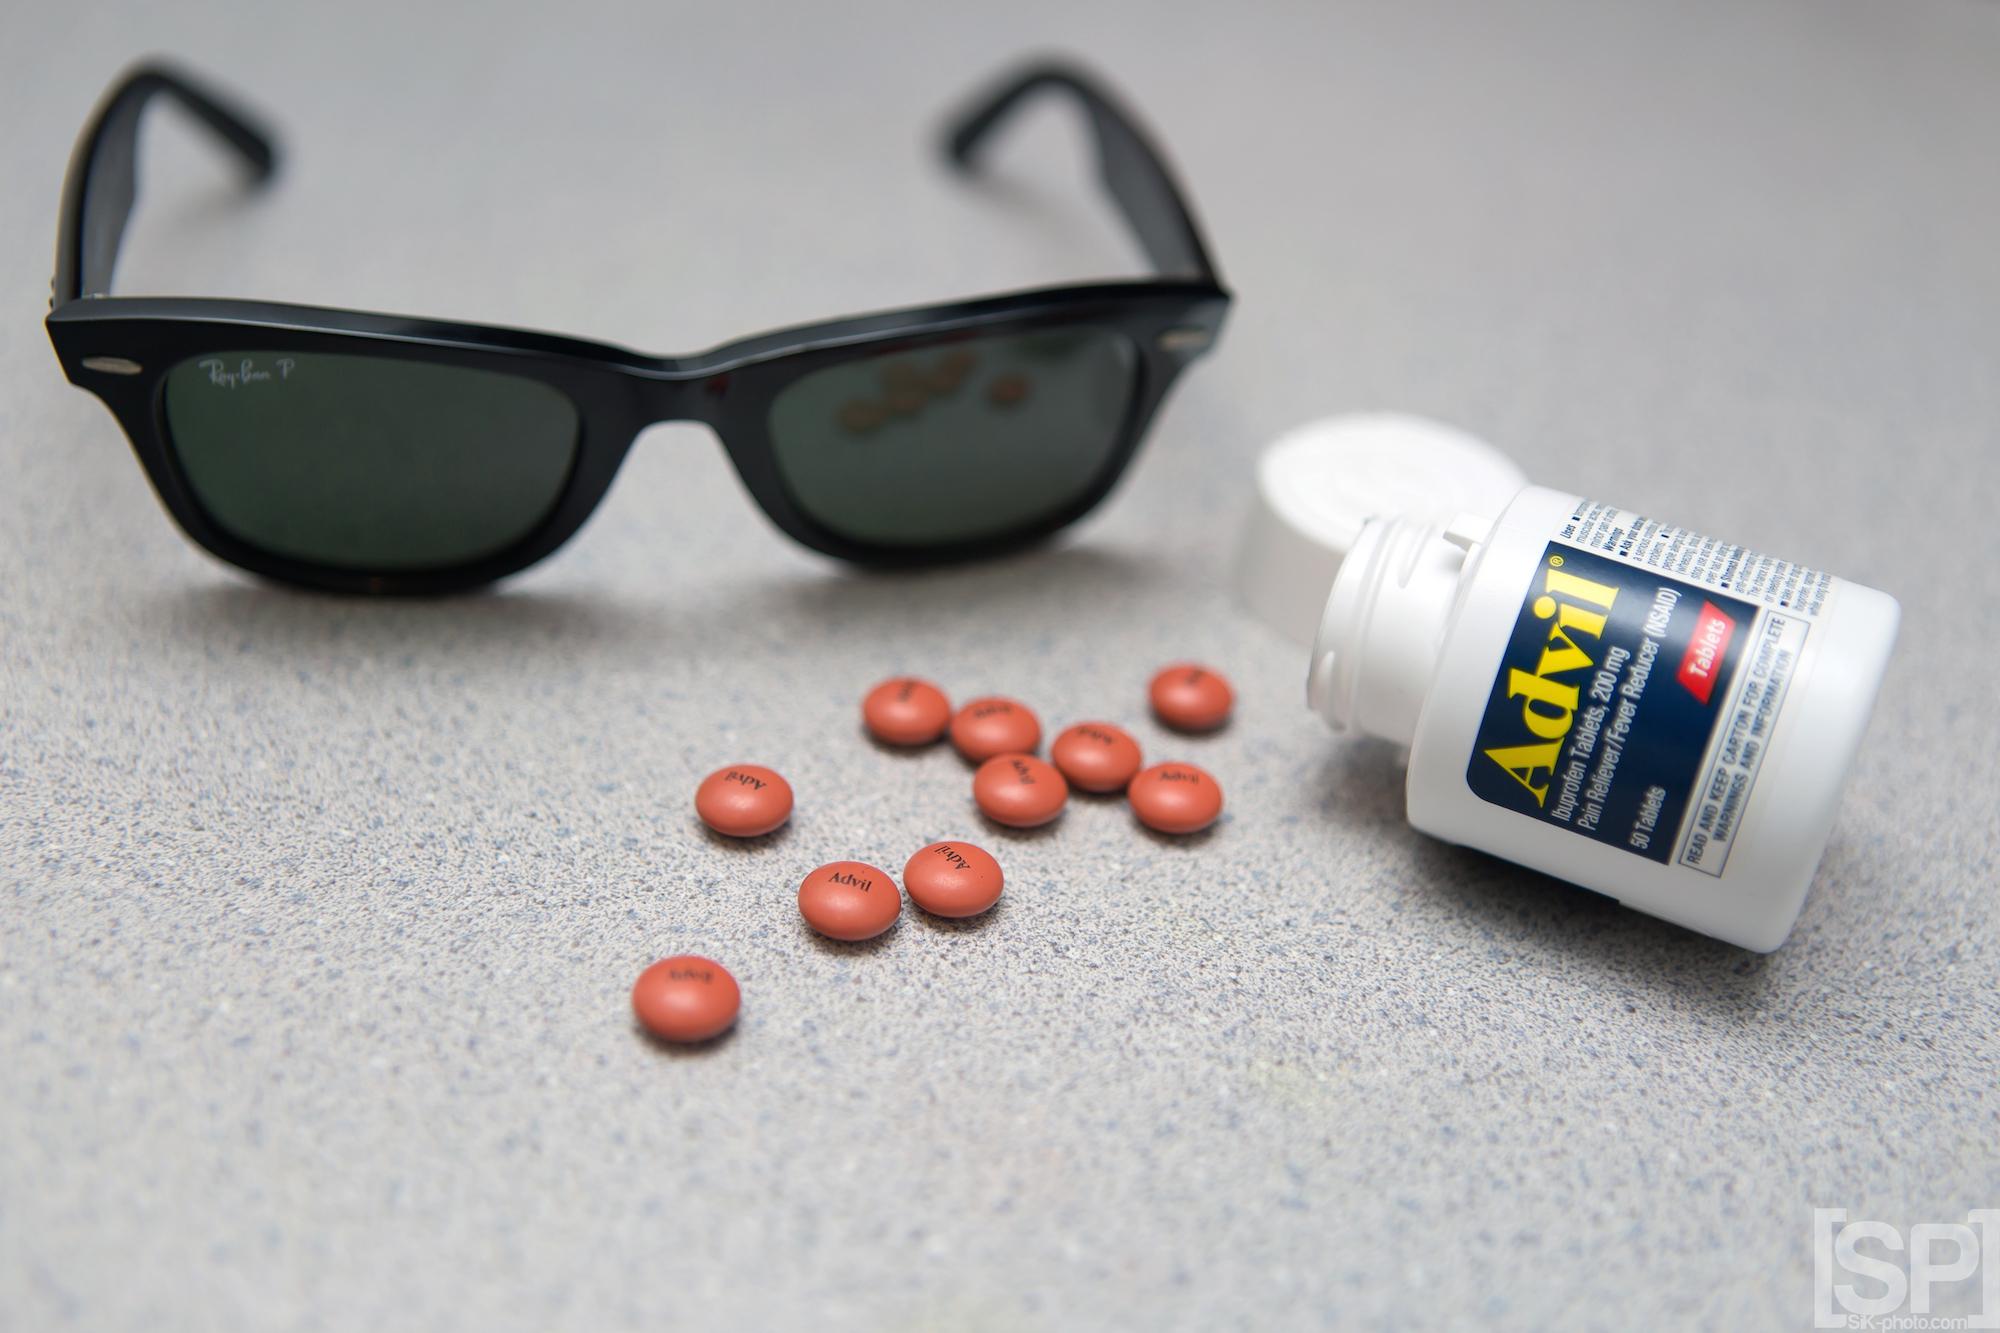 Advil sunglasses